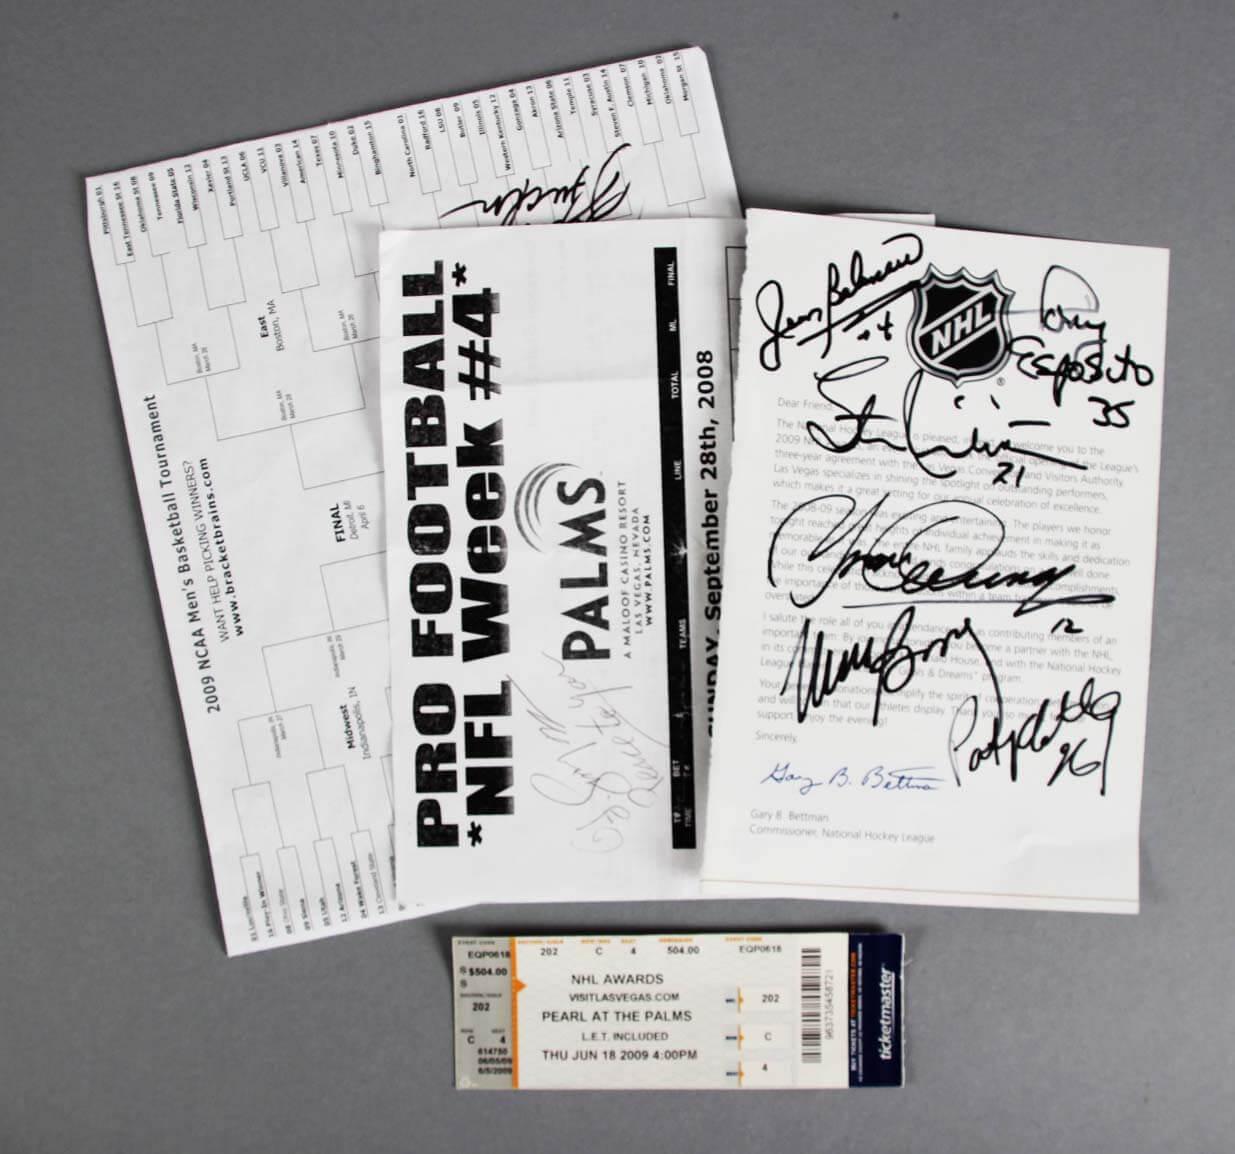 10 Sports Signed Items - OJ Simpson, Bob Knight, etc. - COA JSA